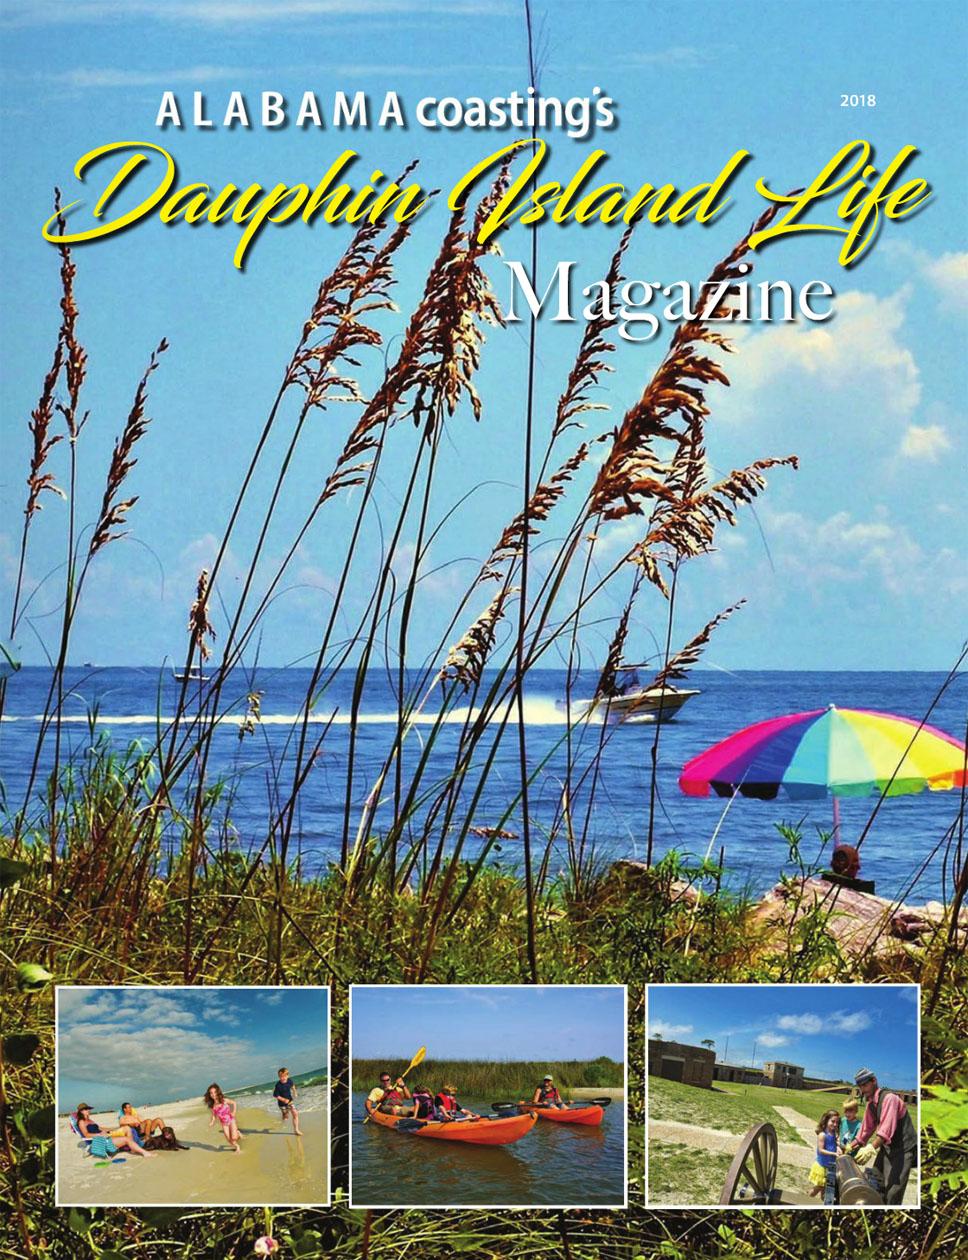 Alabama Coasting Magazine Dauphin Island Life 2018